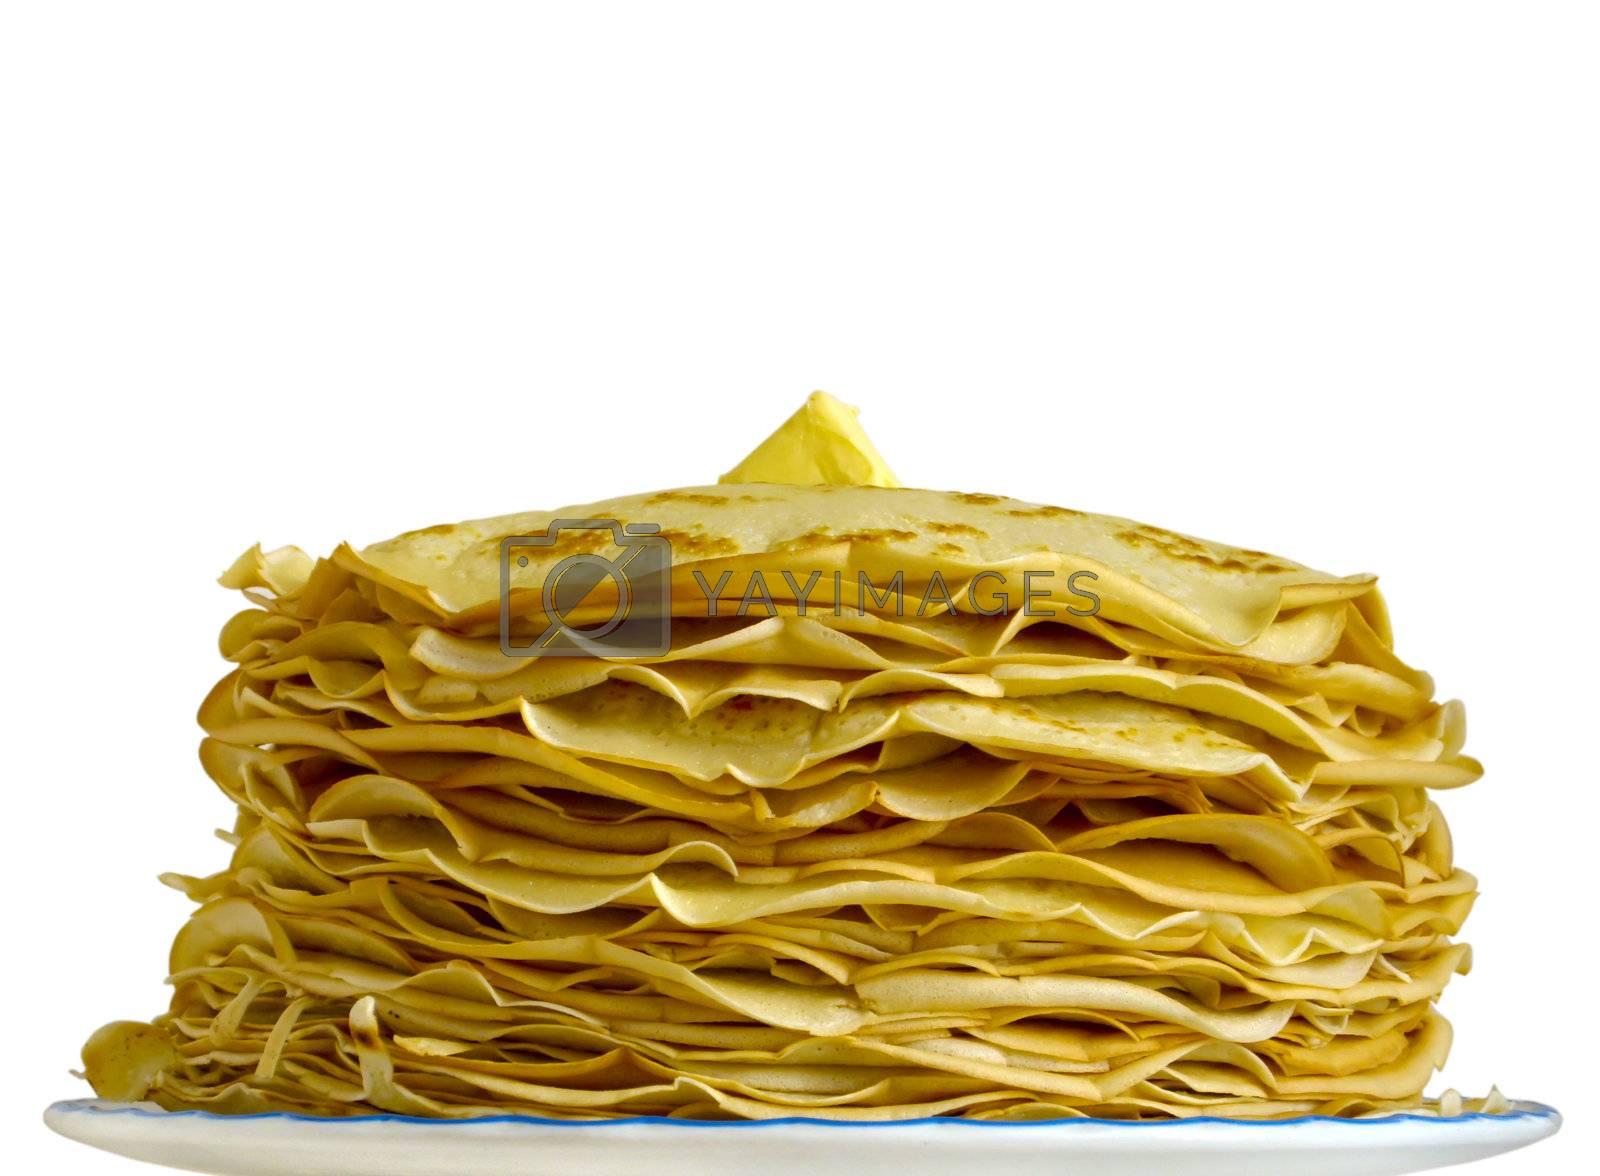 pancakes by Woldee